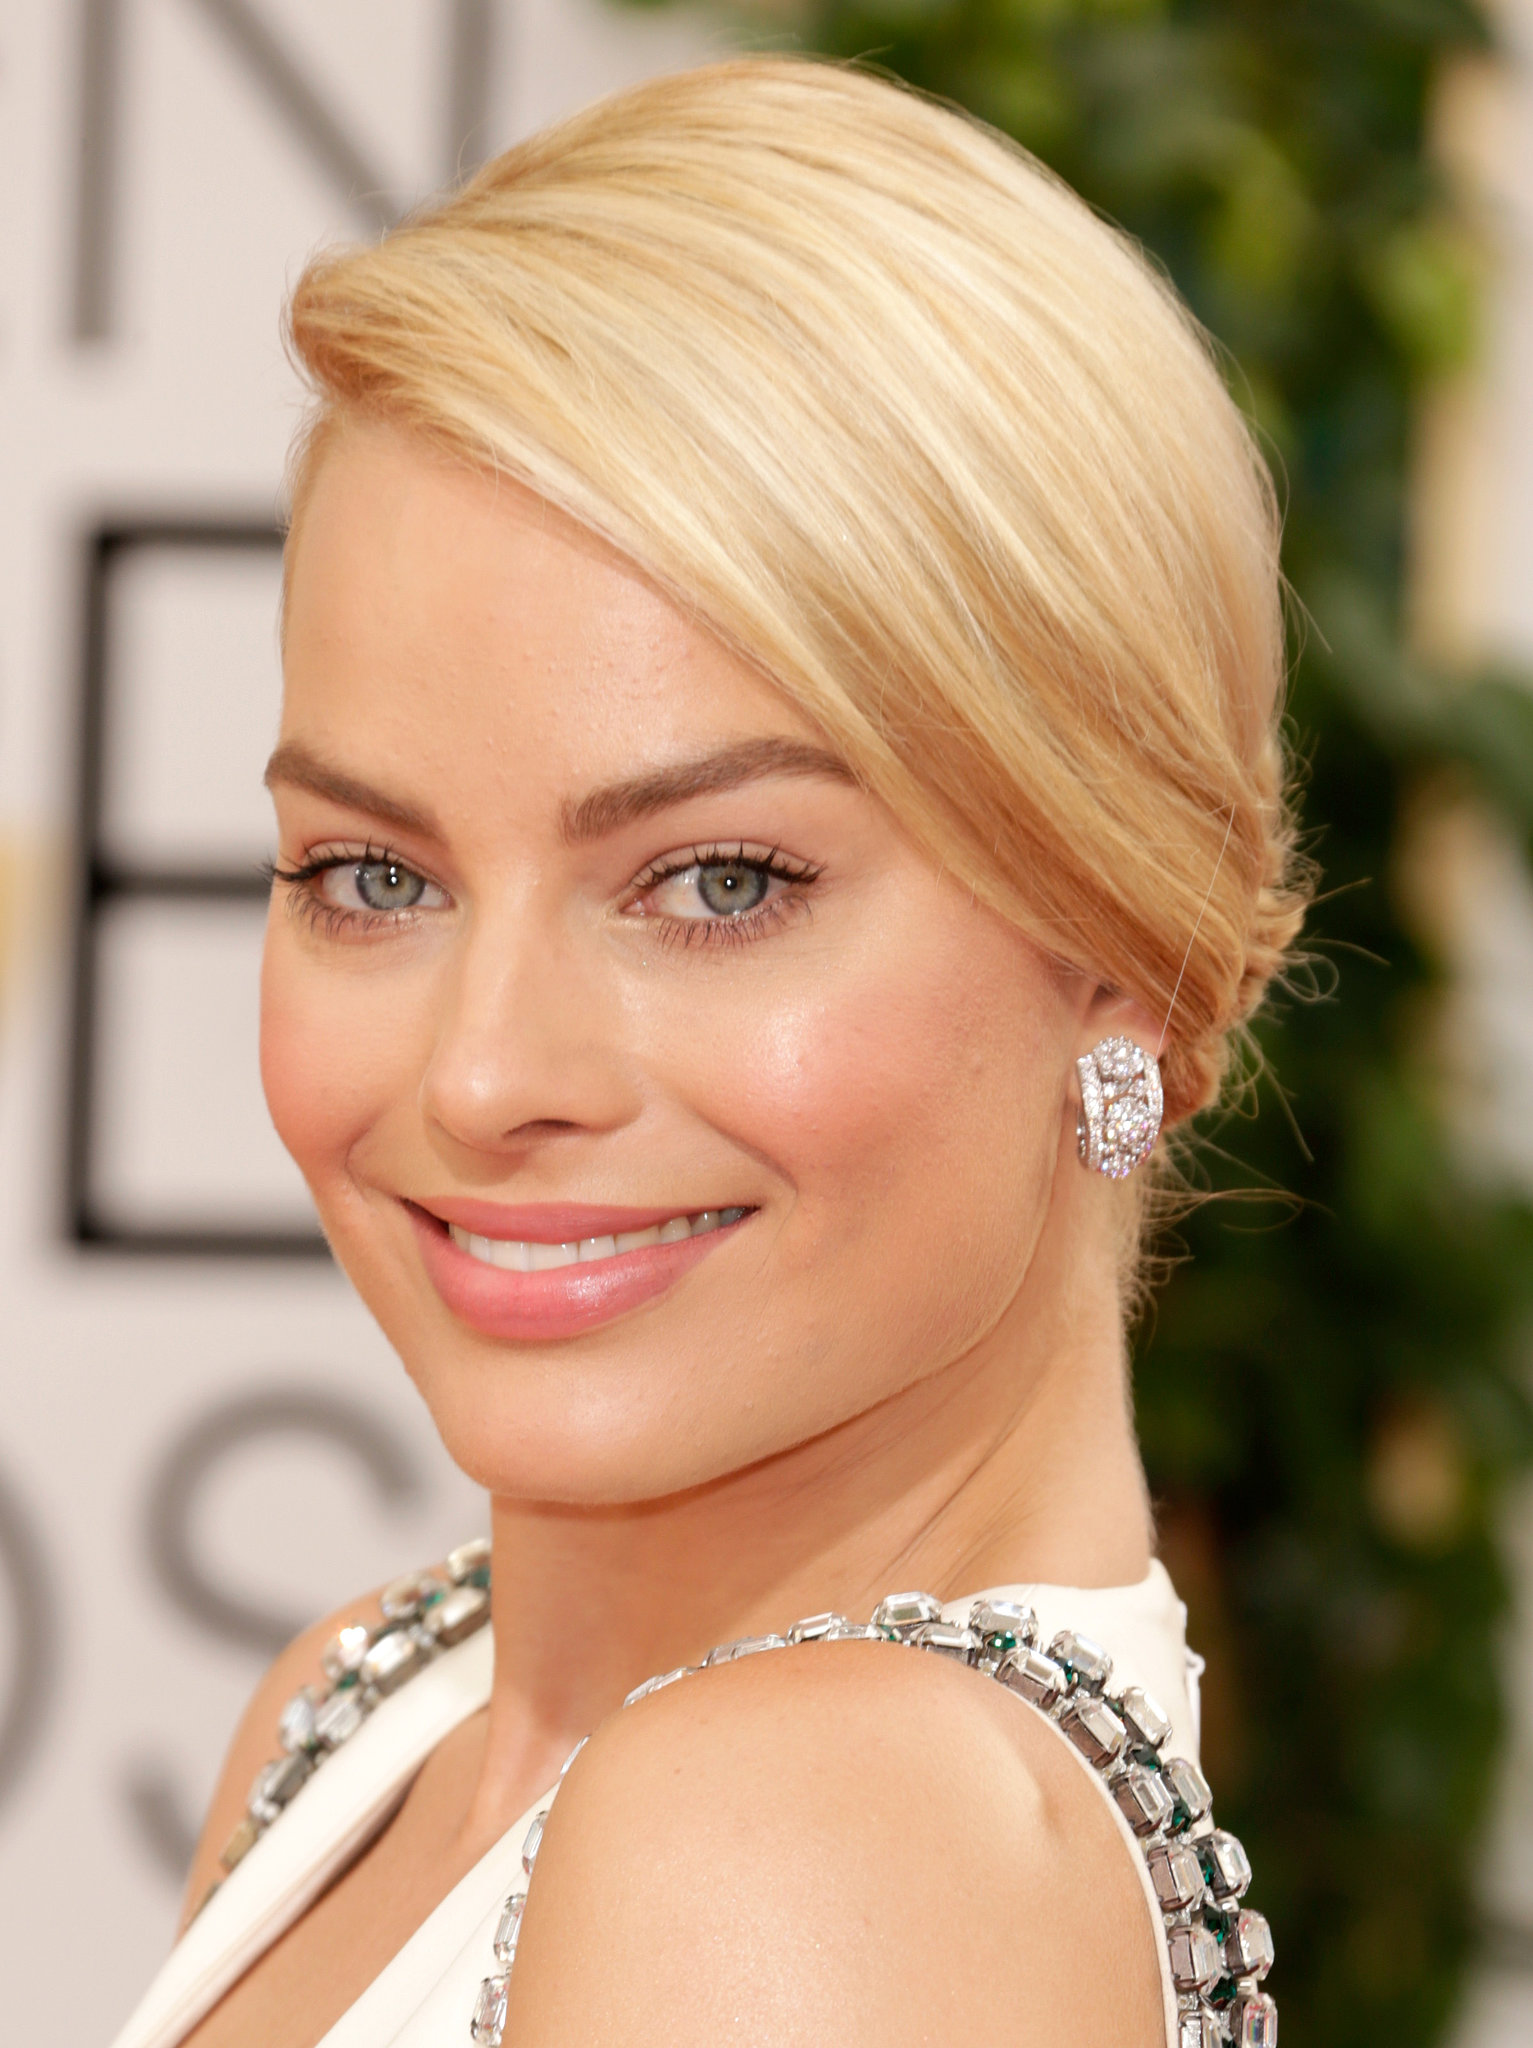 Margot Robbie accessorized with major diamond earrings.